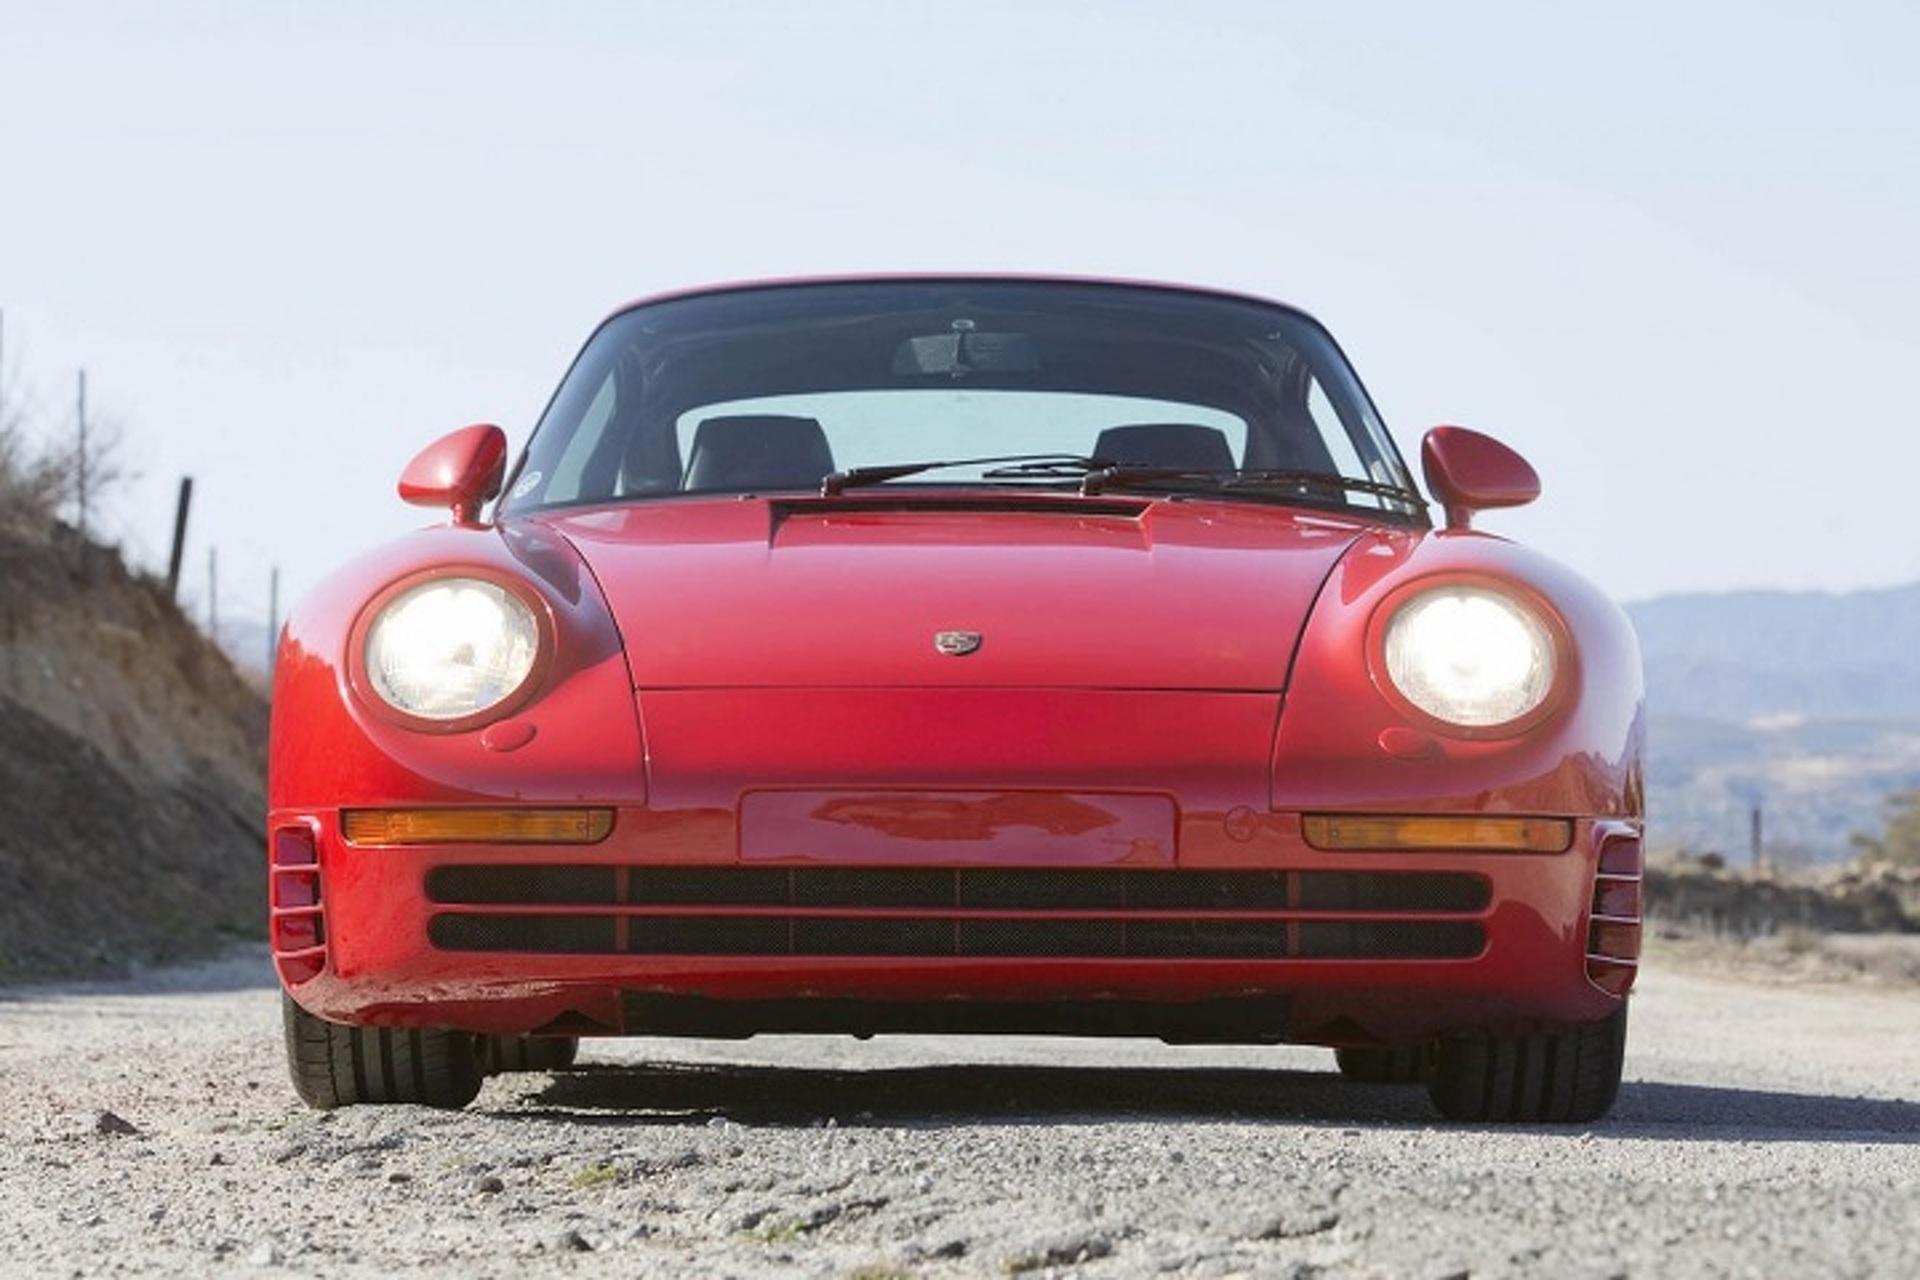 Driving a Porsche 959 in the US? Thank Bill Gates